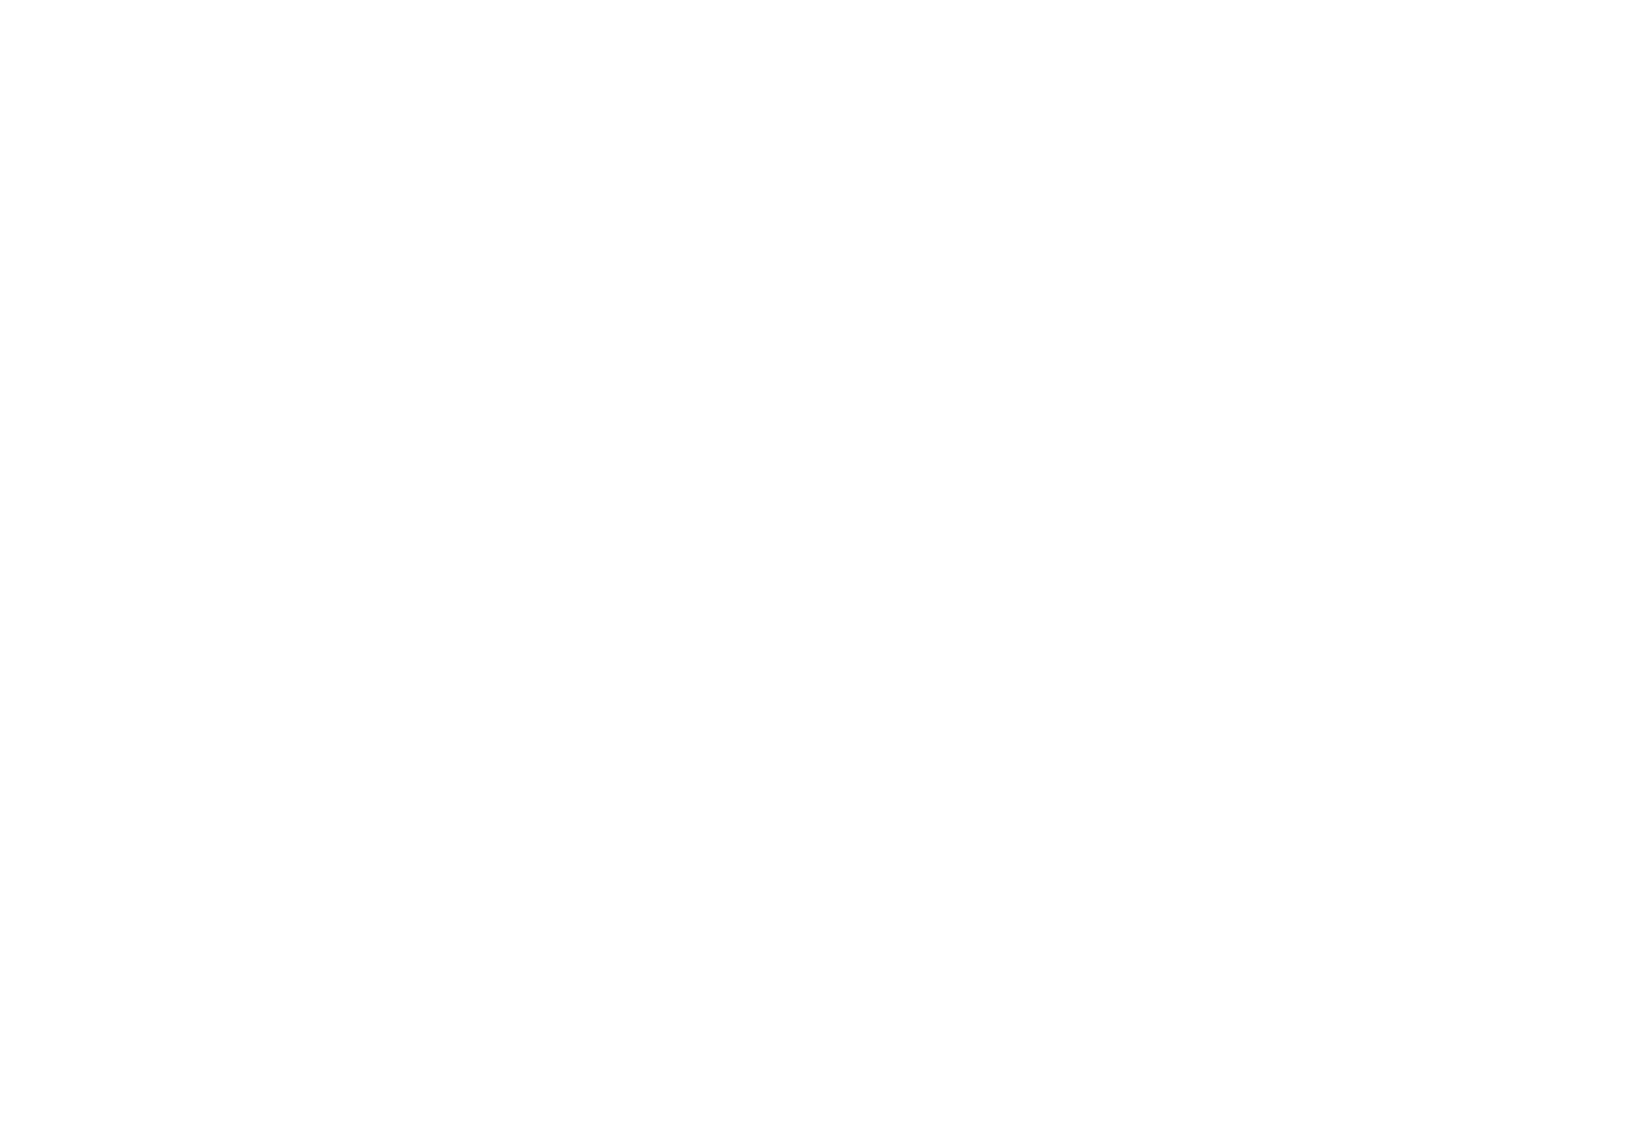 national association of home builders logo